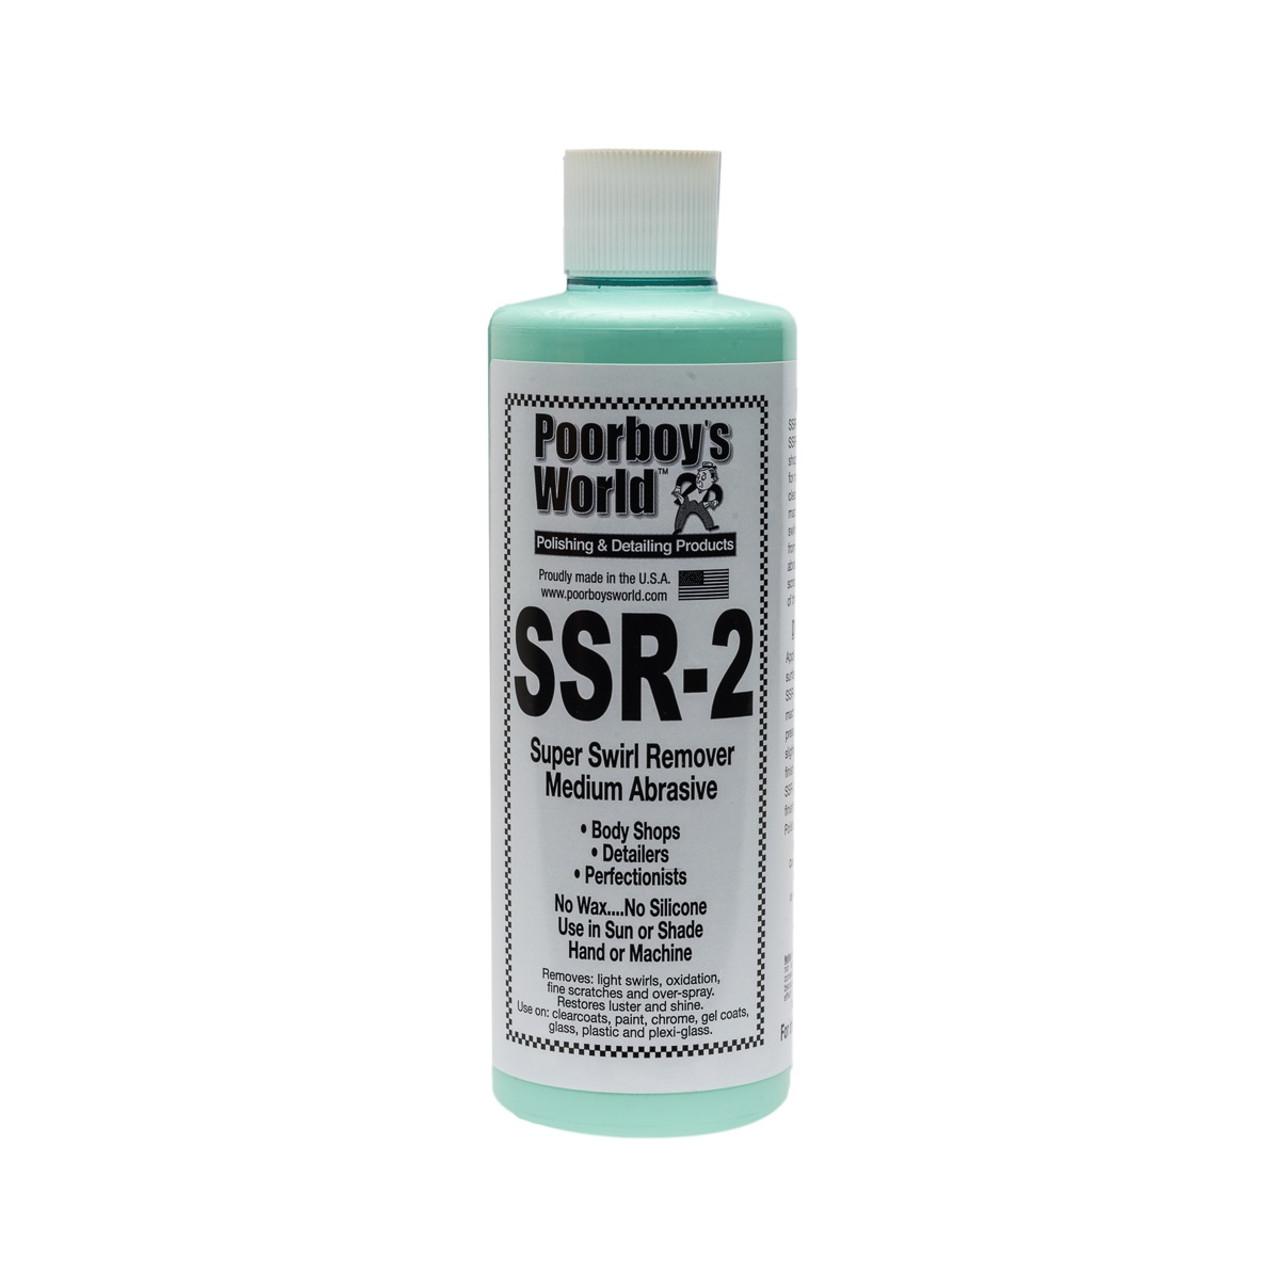 Poorboy's World SSR-2 Super Swirl Remover 16oz